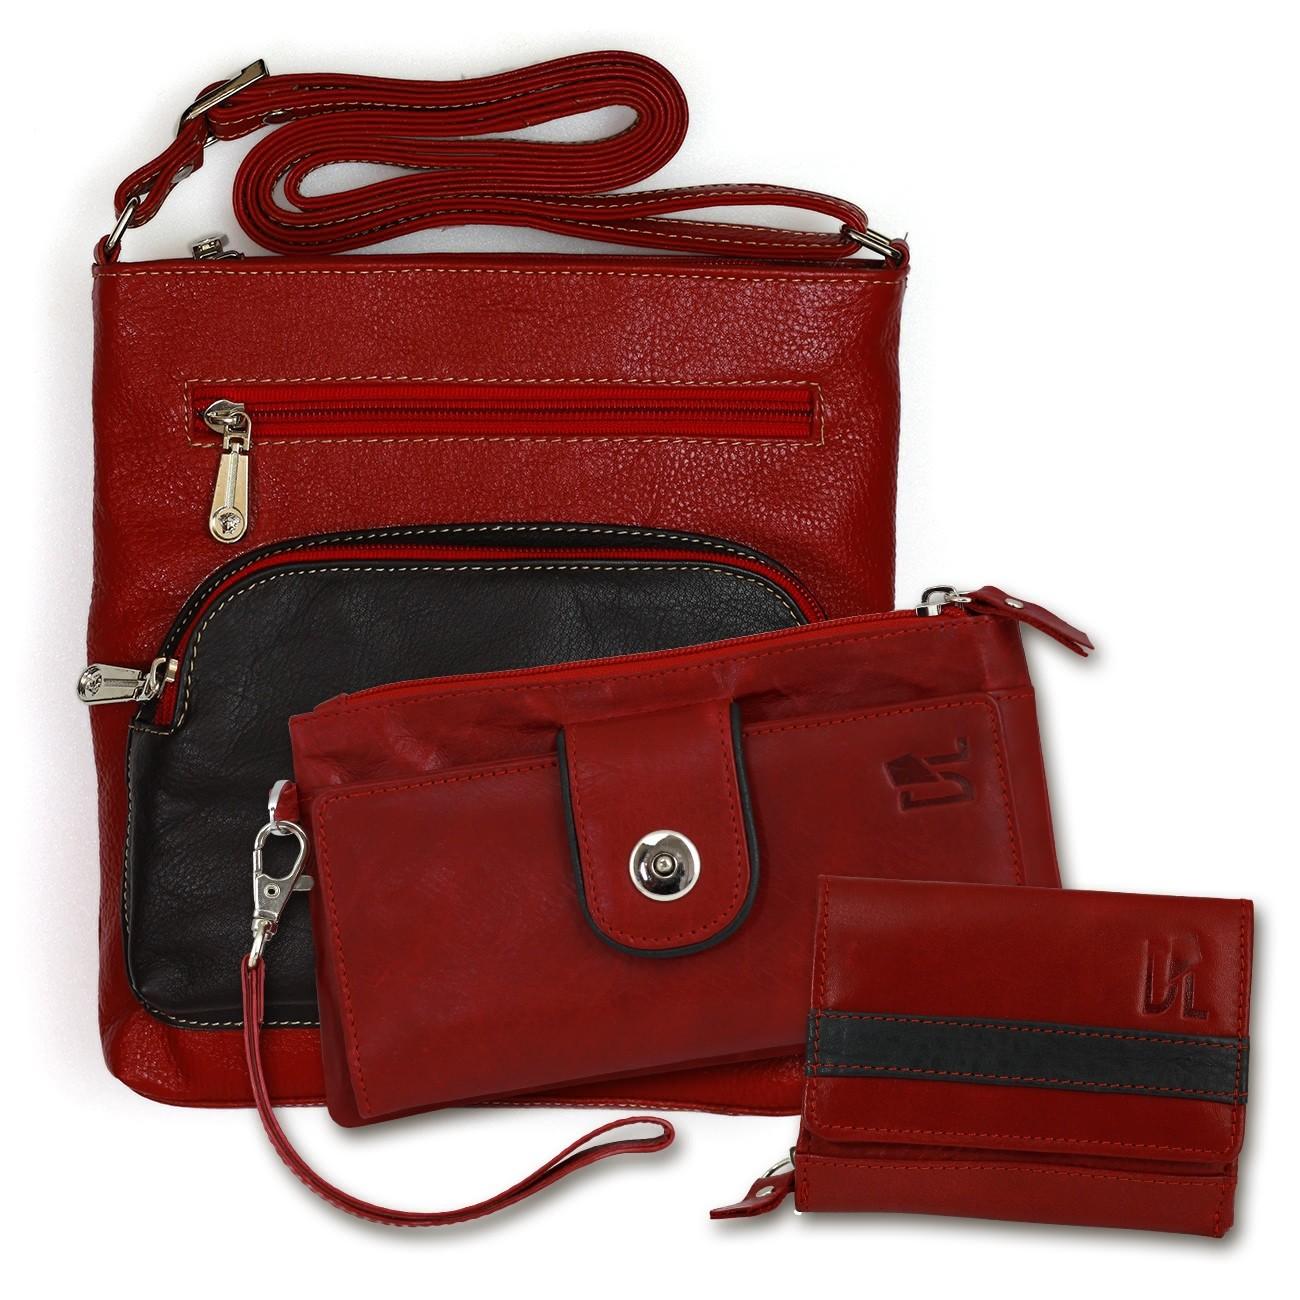 Umhängetasche + Geldbörse + Wristlet Set Leder rot Geschenkset 3tlg. OSZ101R